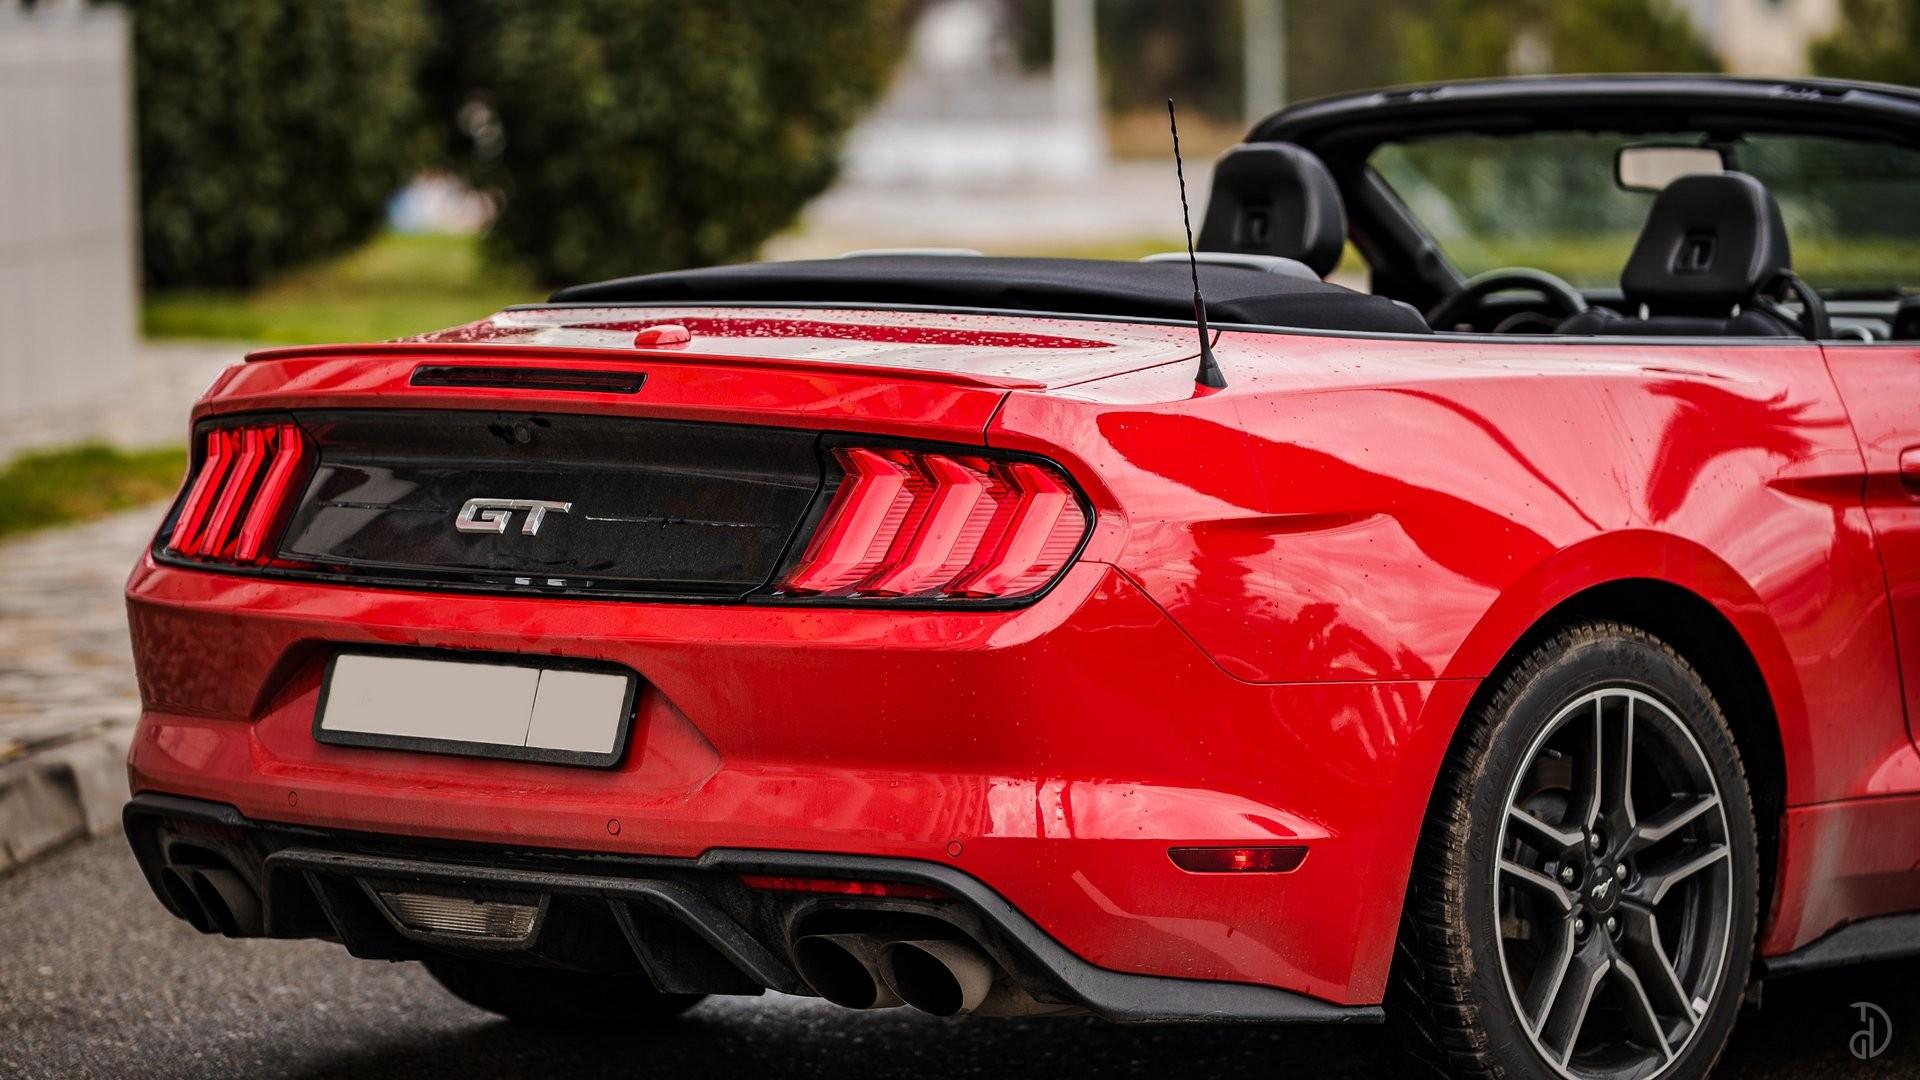 Аренда Ford Mustang GT 5.0 в Сочи. Фото 6